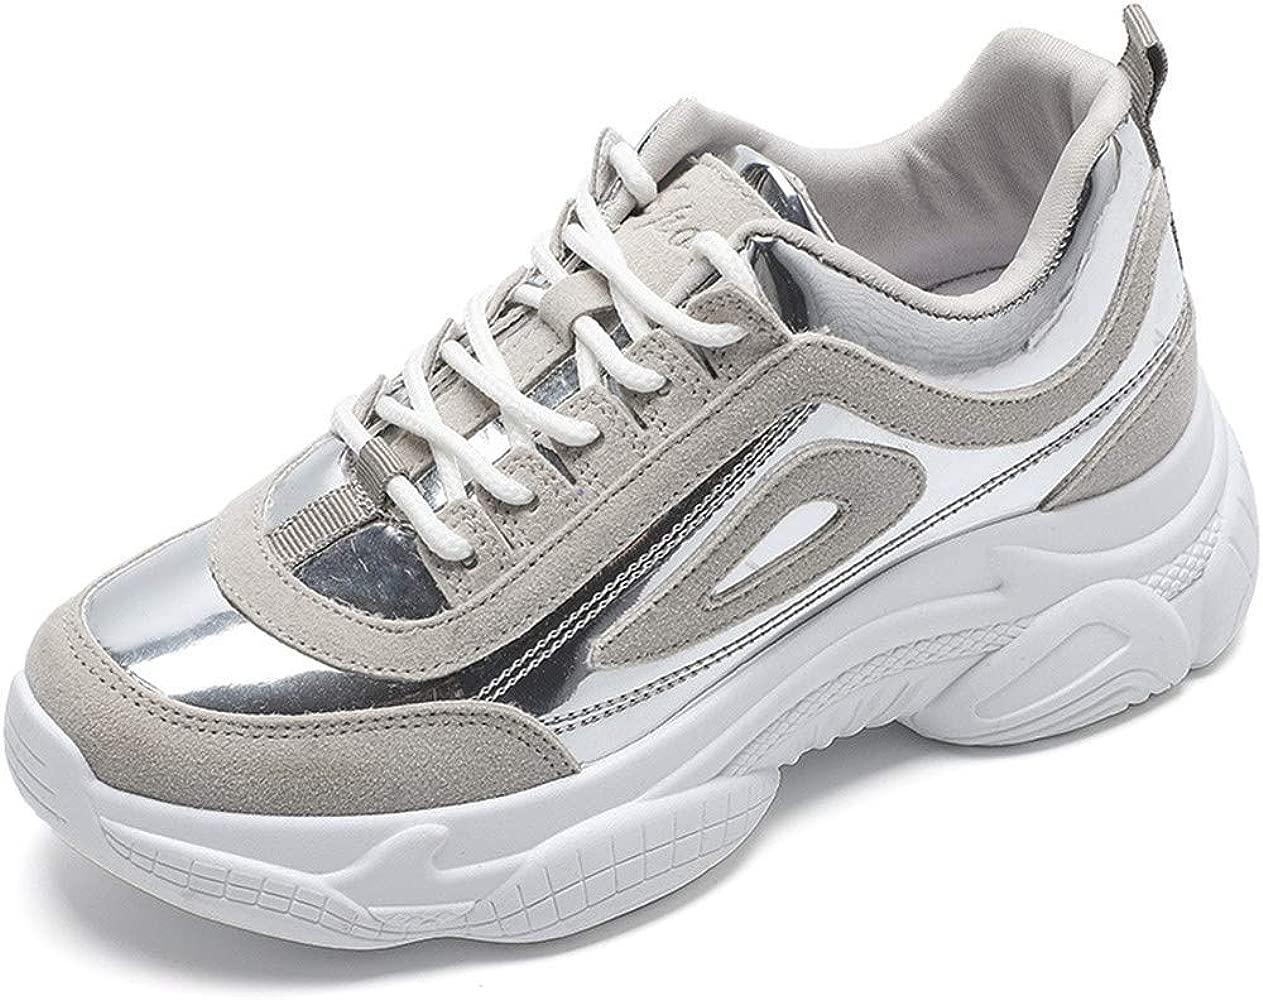 Zapatillas Deportivas de Mujer - Zapatillas Mujer Running ...